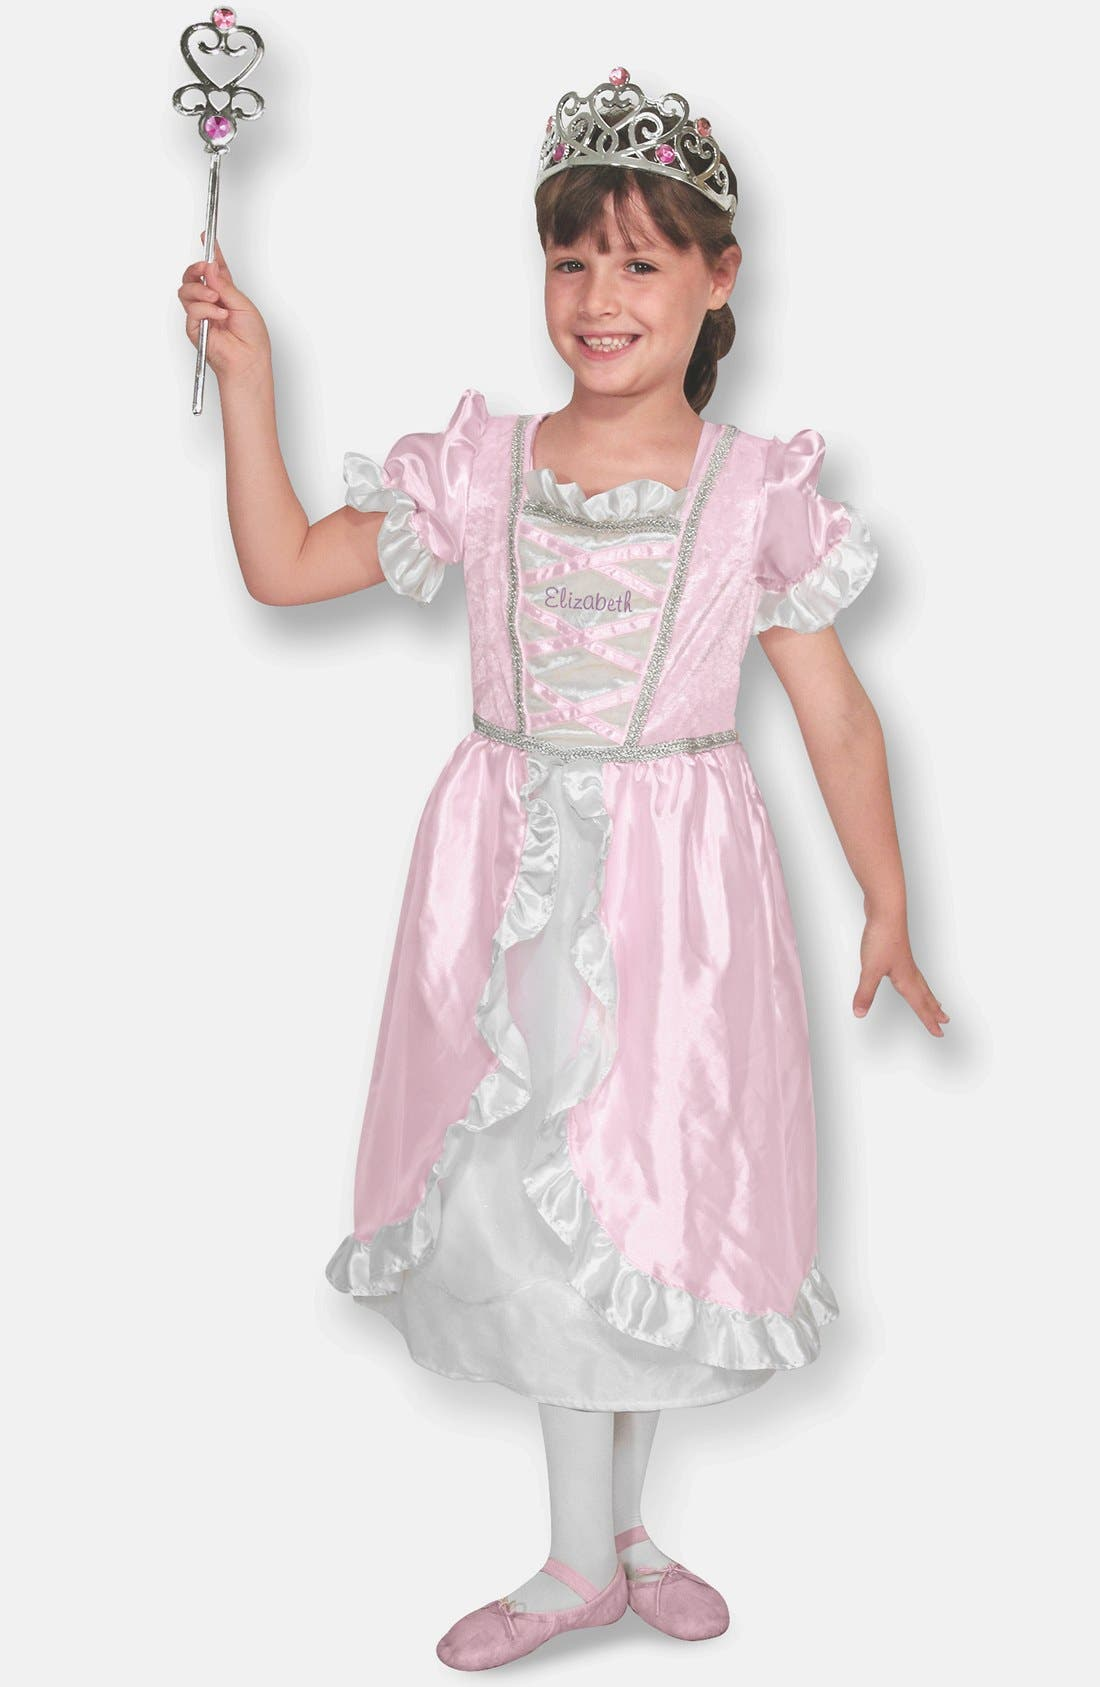 Personalized Princess Costume,                             Alternate thumbnail 4, color,                             650